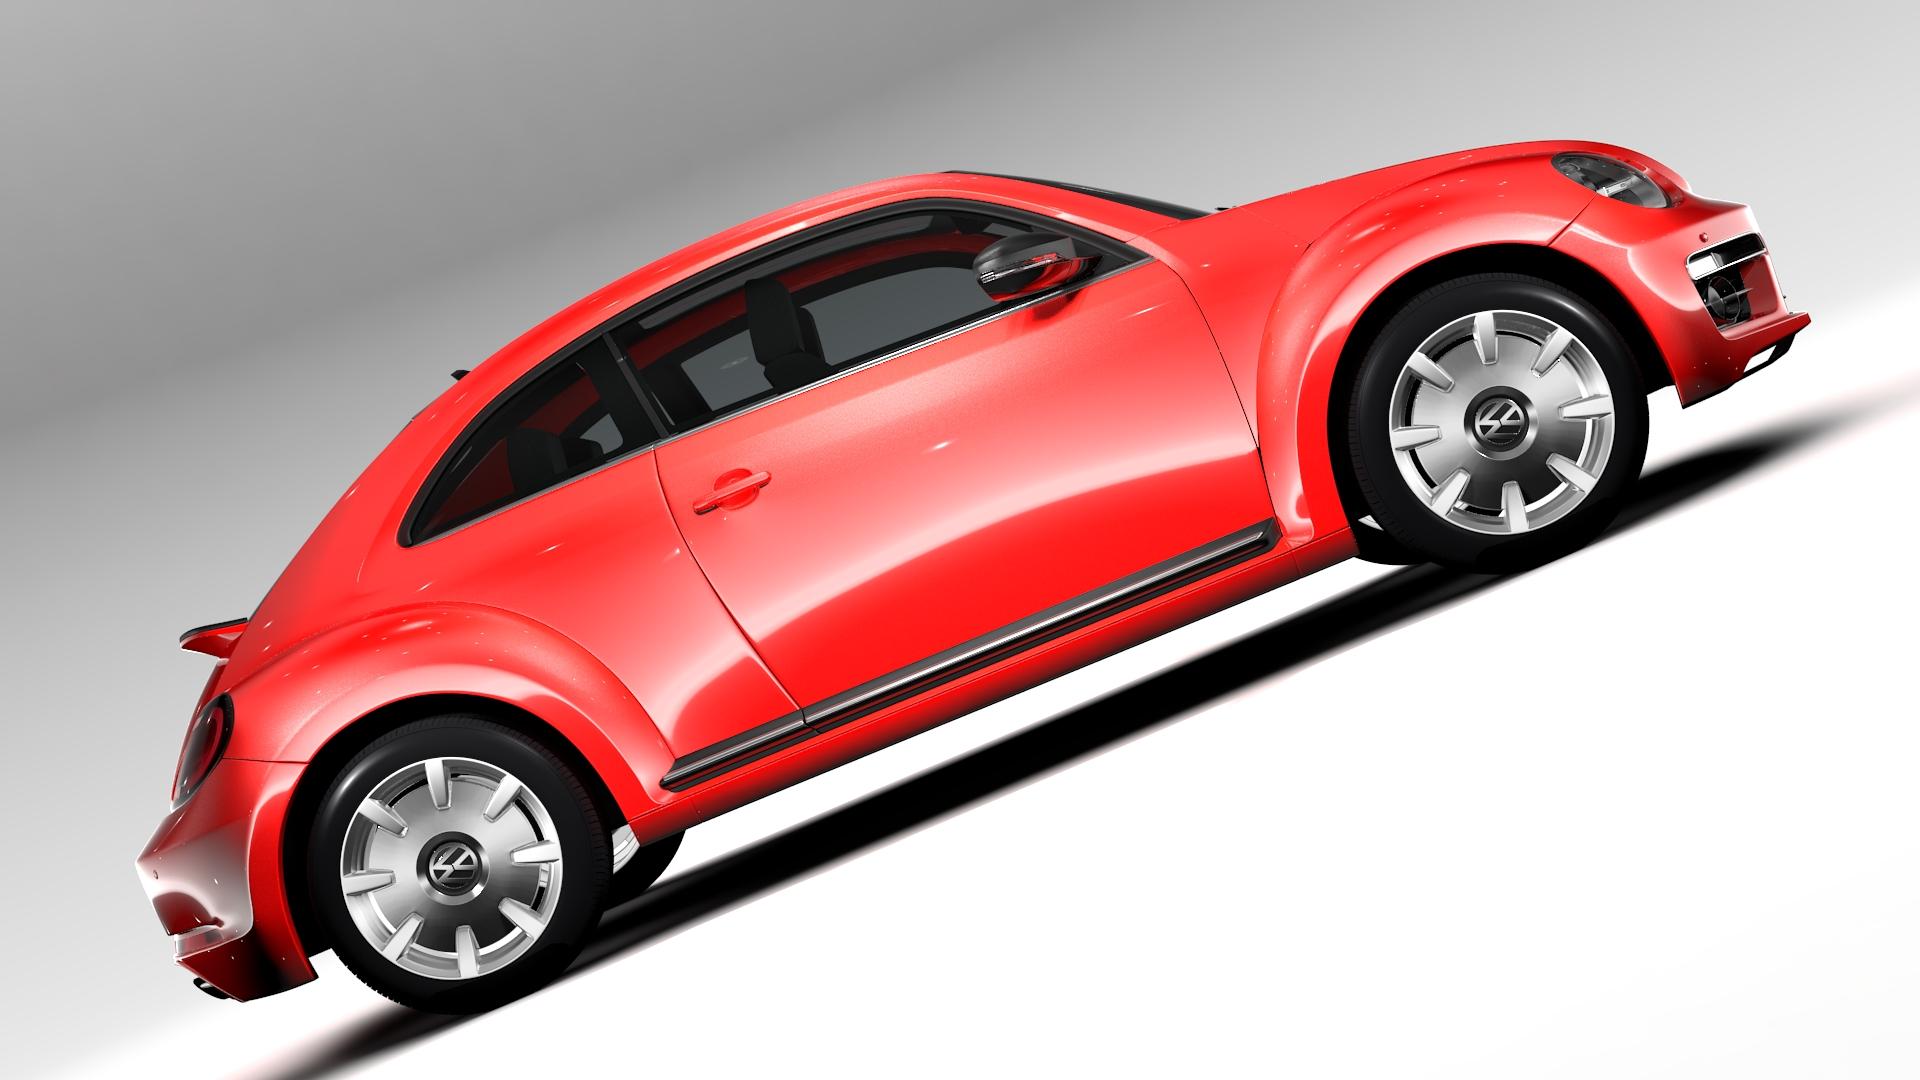 vw beetle turbo 2017 3d model 3ds max fbx c4d lwo ma mb hrc xsi obj 221665